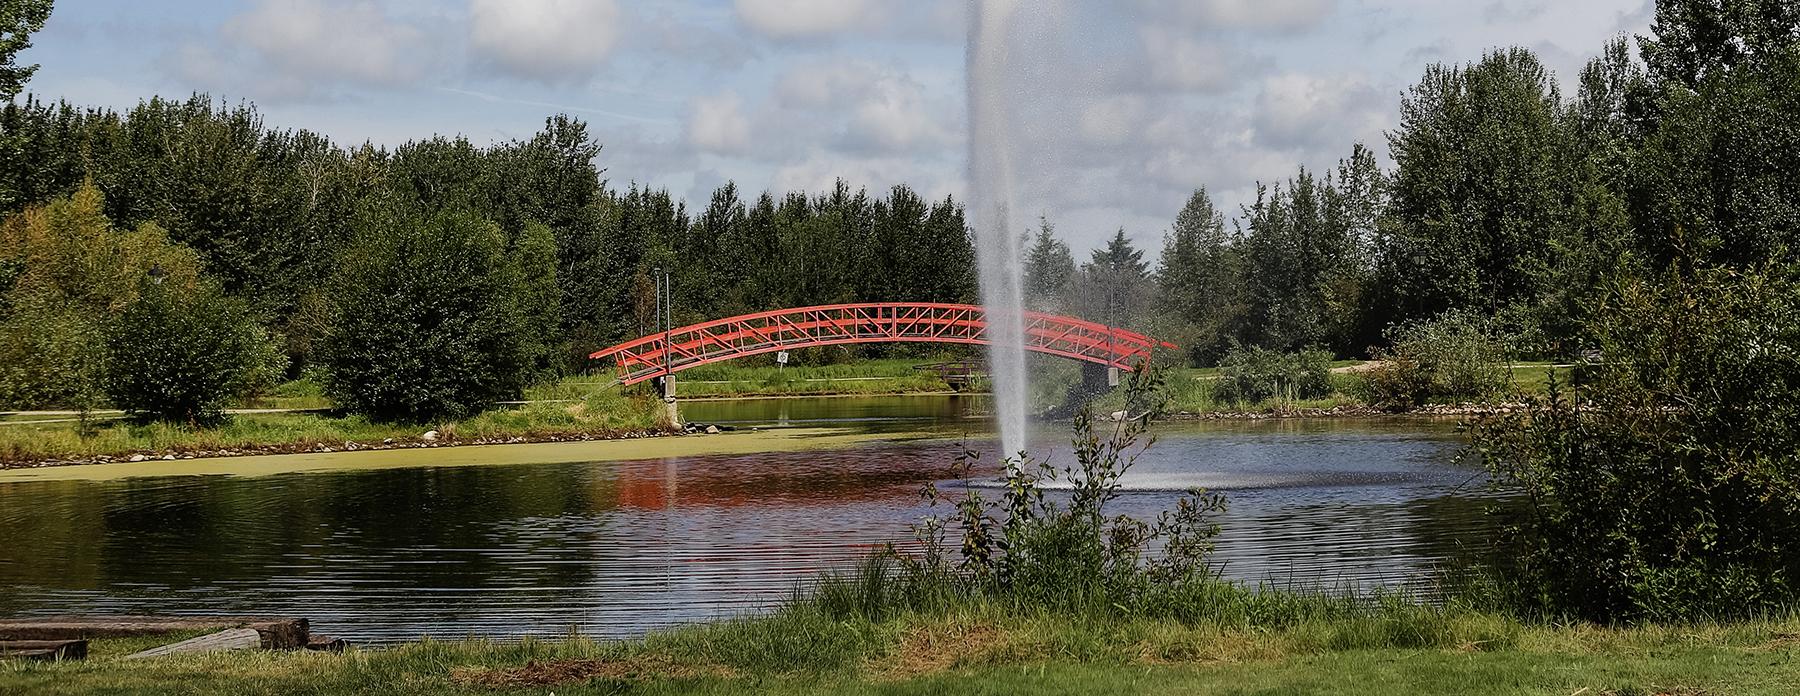 Rotary Park bridge